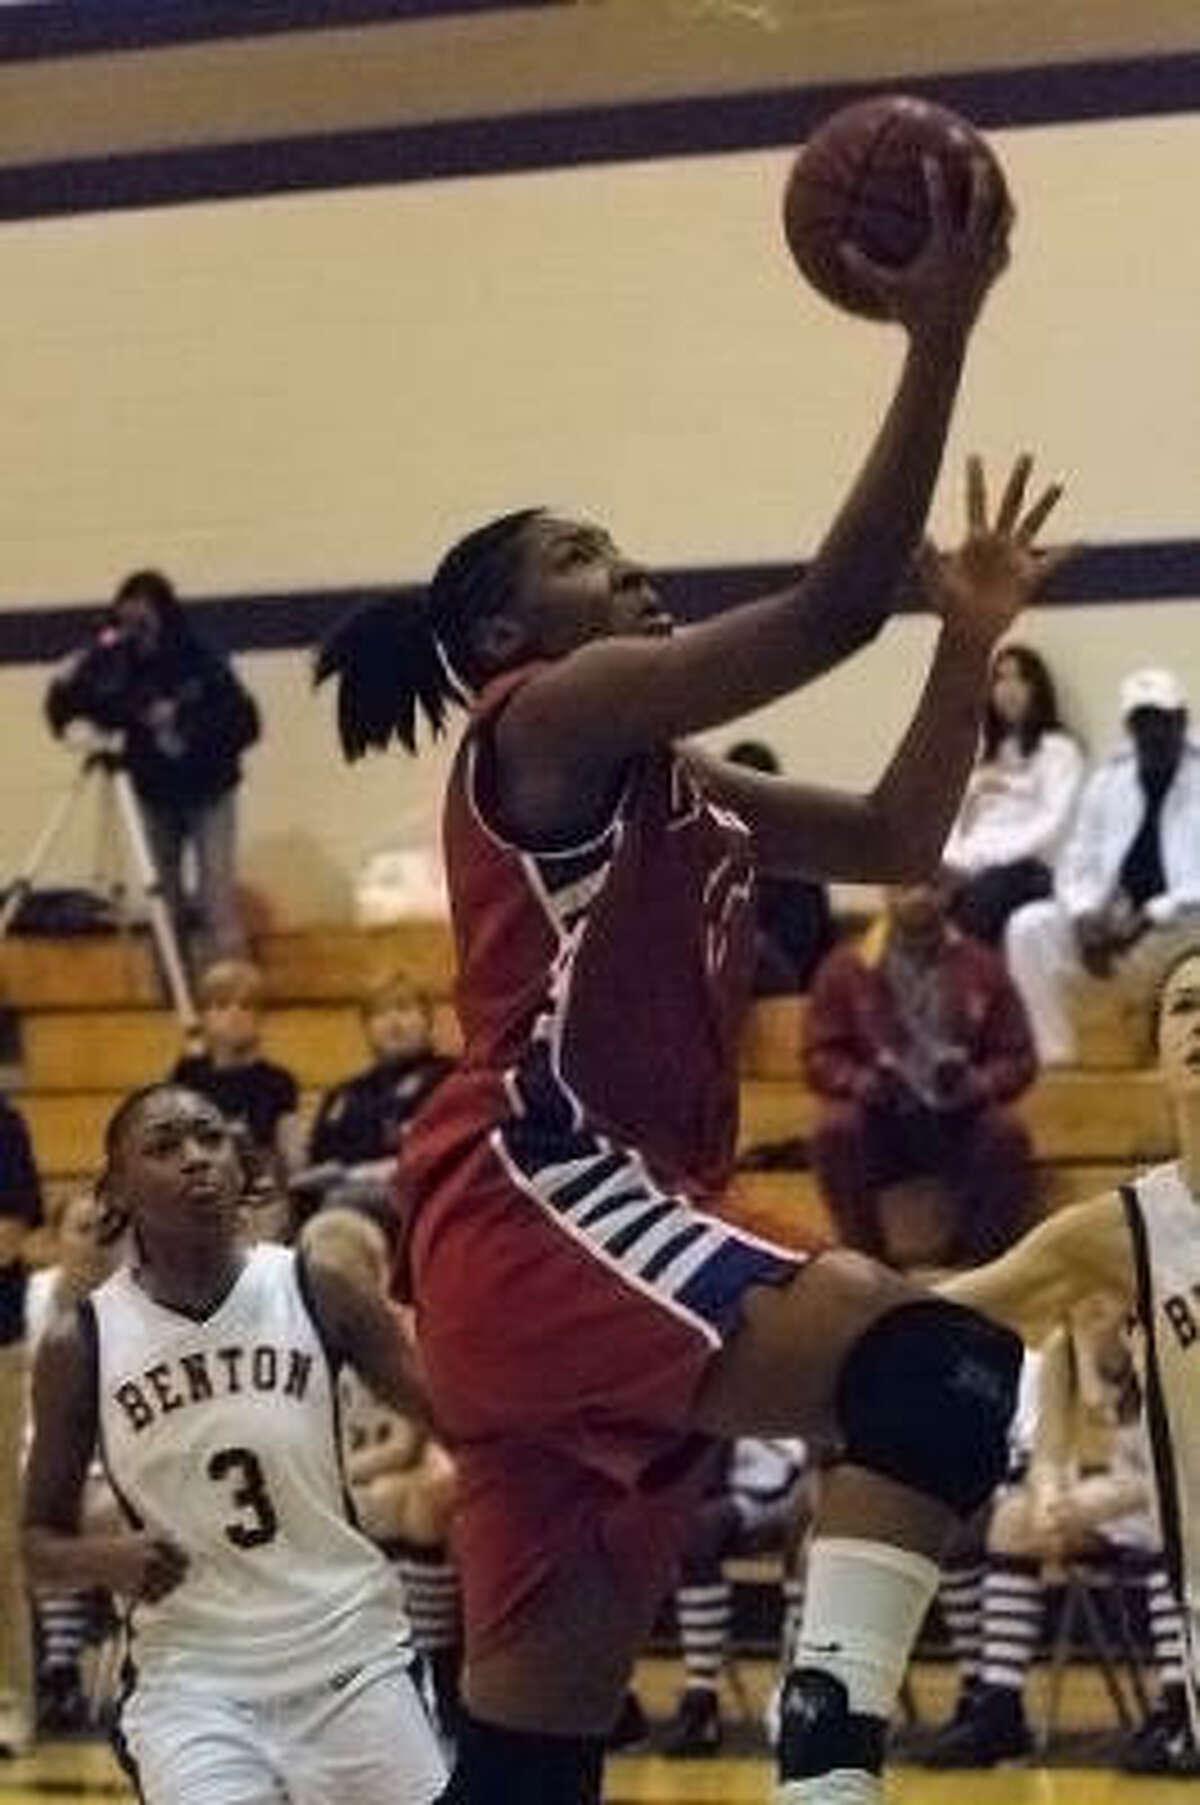 Jan. 30, 2007 Sophomore Kelsey Bone drives against Benton, La., High. in the Katy Invitational Basketball Tournament at Morton Ranch High School. Bone's Dulles squad defeated Benton, 89-51.